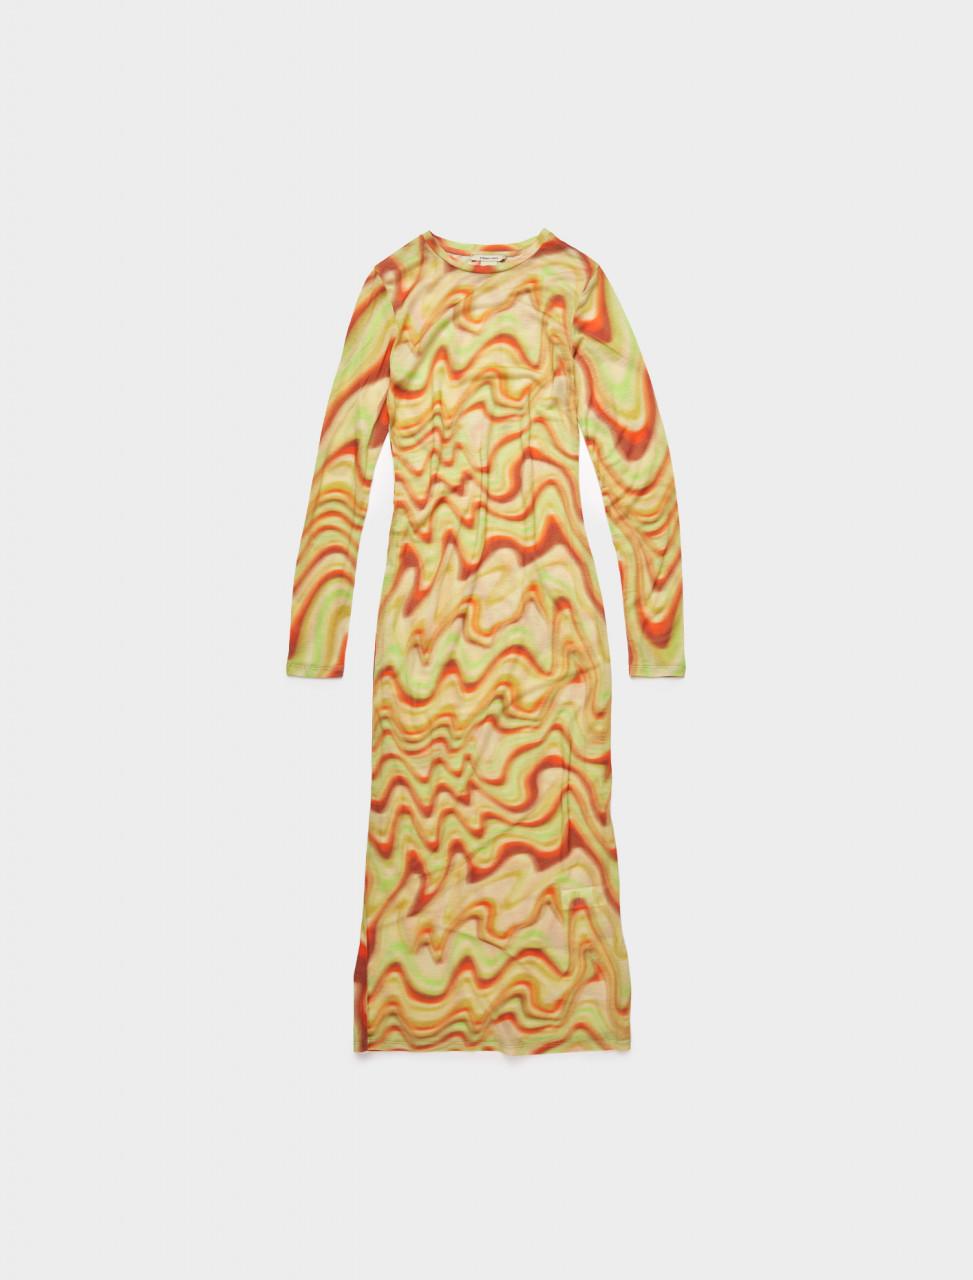 300-PJL010-144 PALOMA WOOL PROBLEMA DRESS